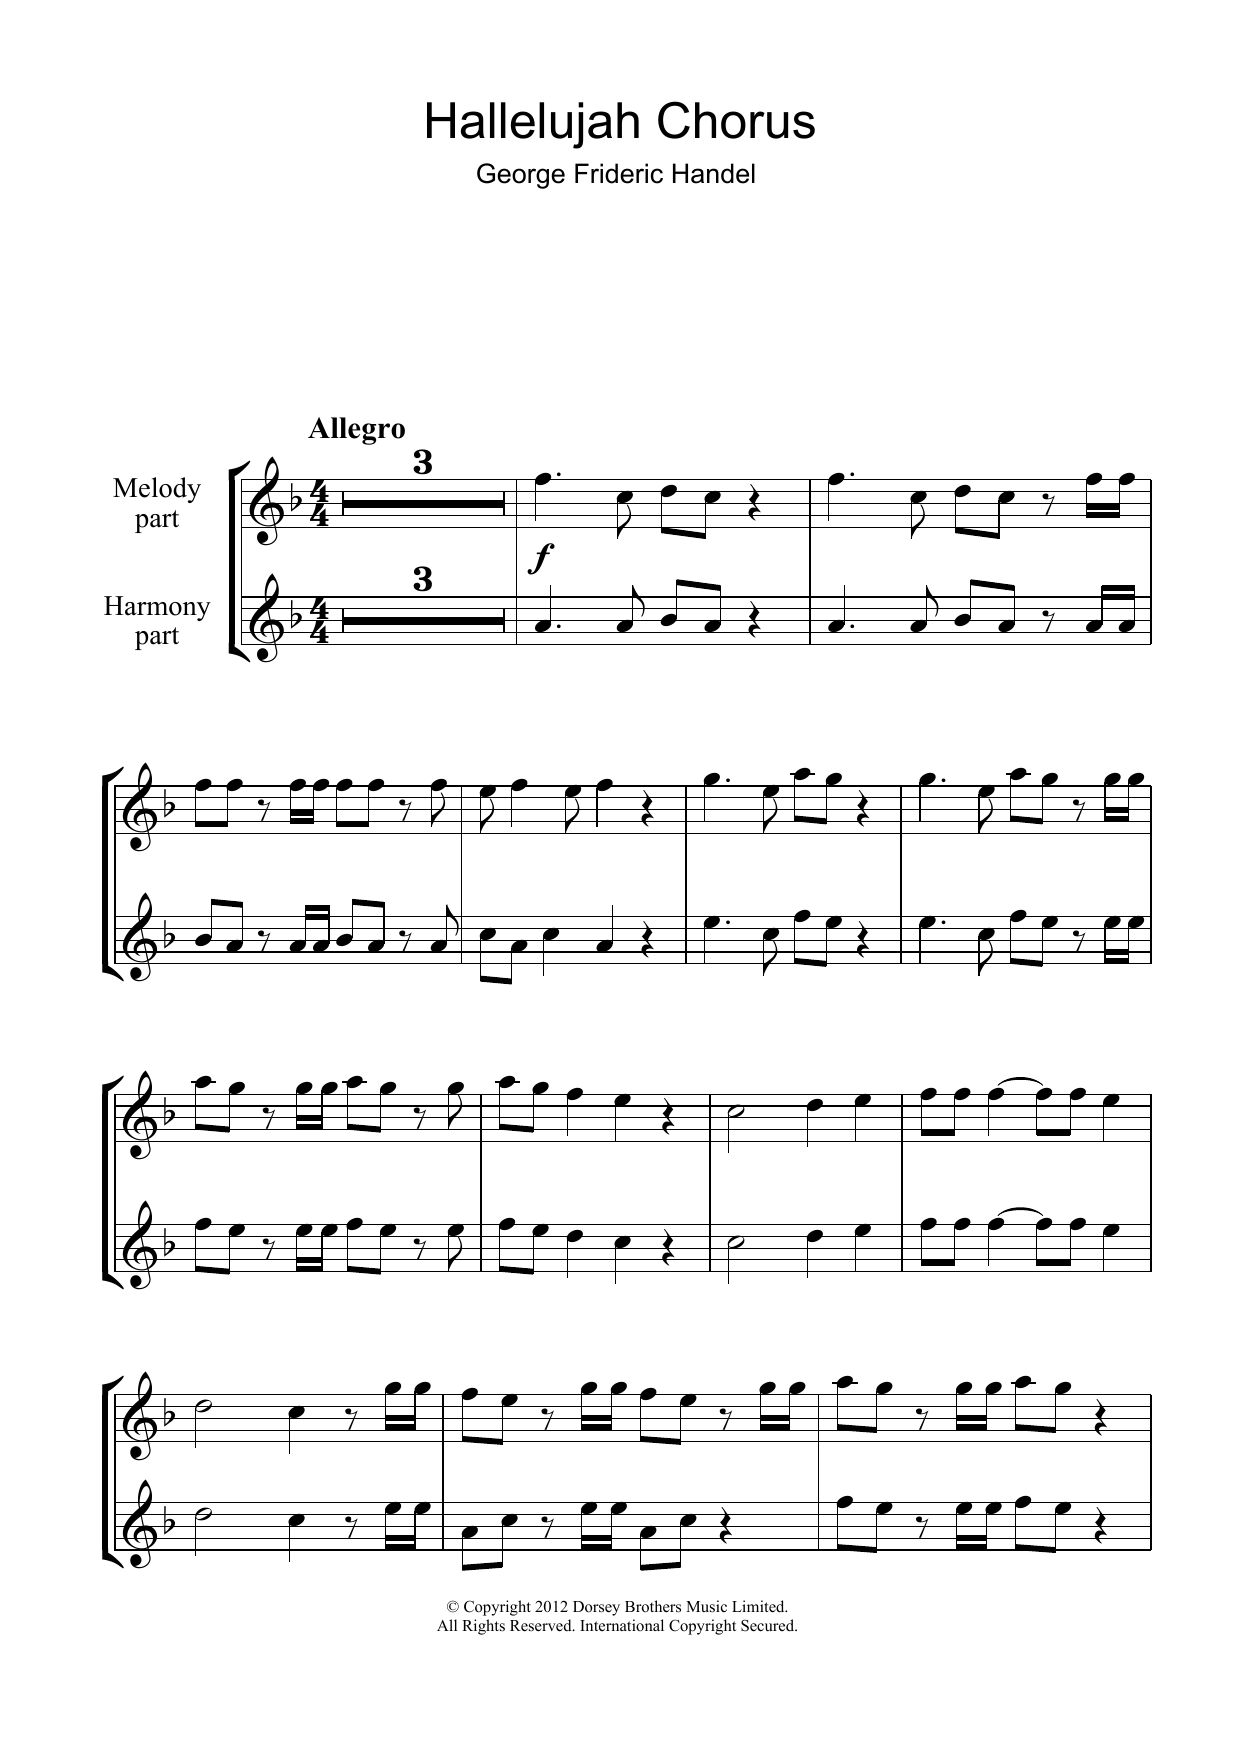 Hallelujah Chorus (from The Messiah) Sheet Music | George Frideric ...